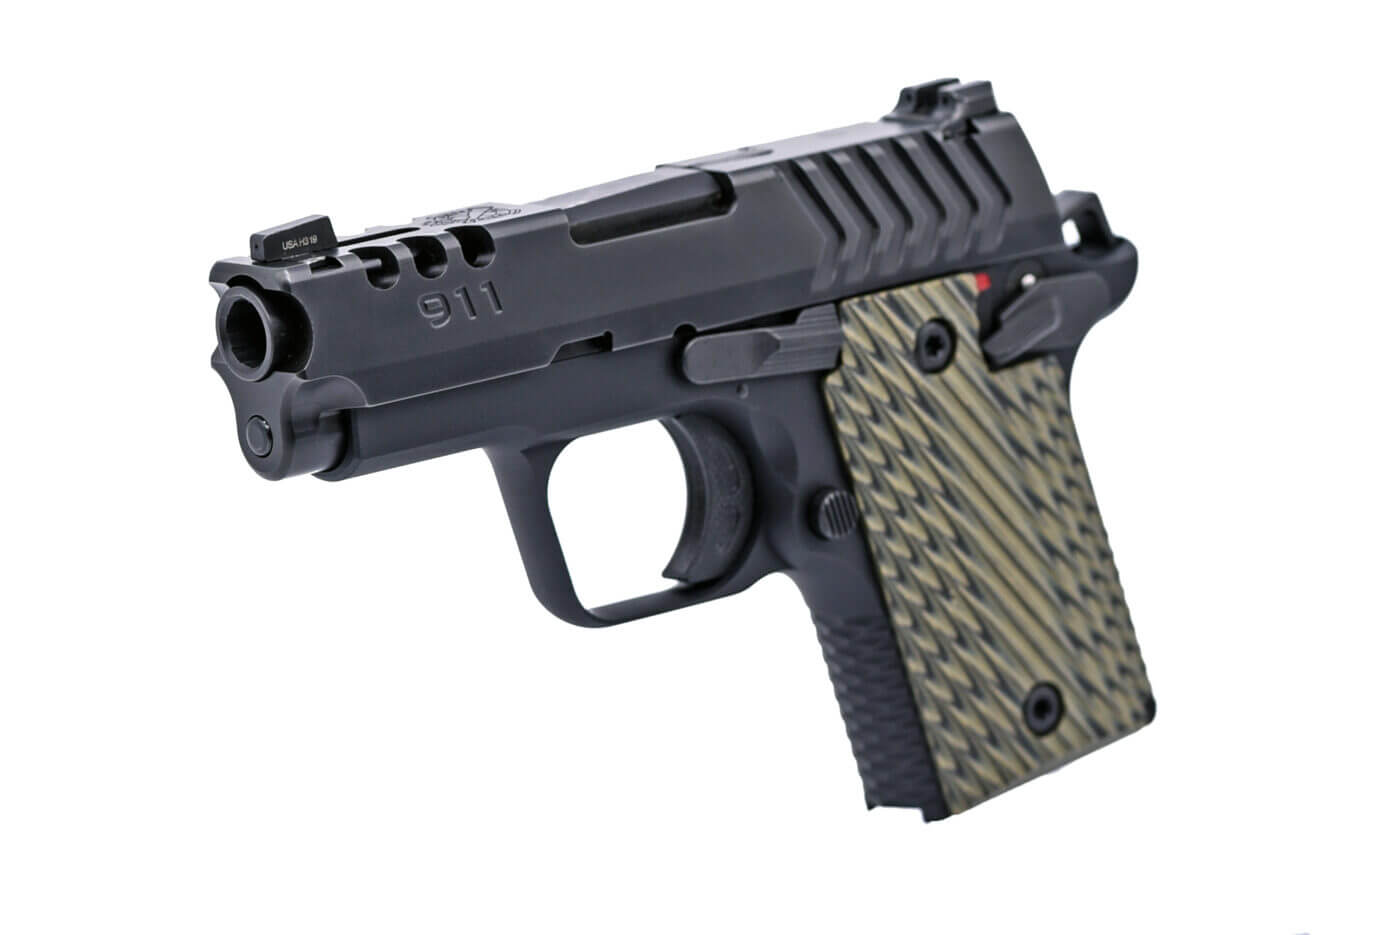 Cobra cut on 911 pistol